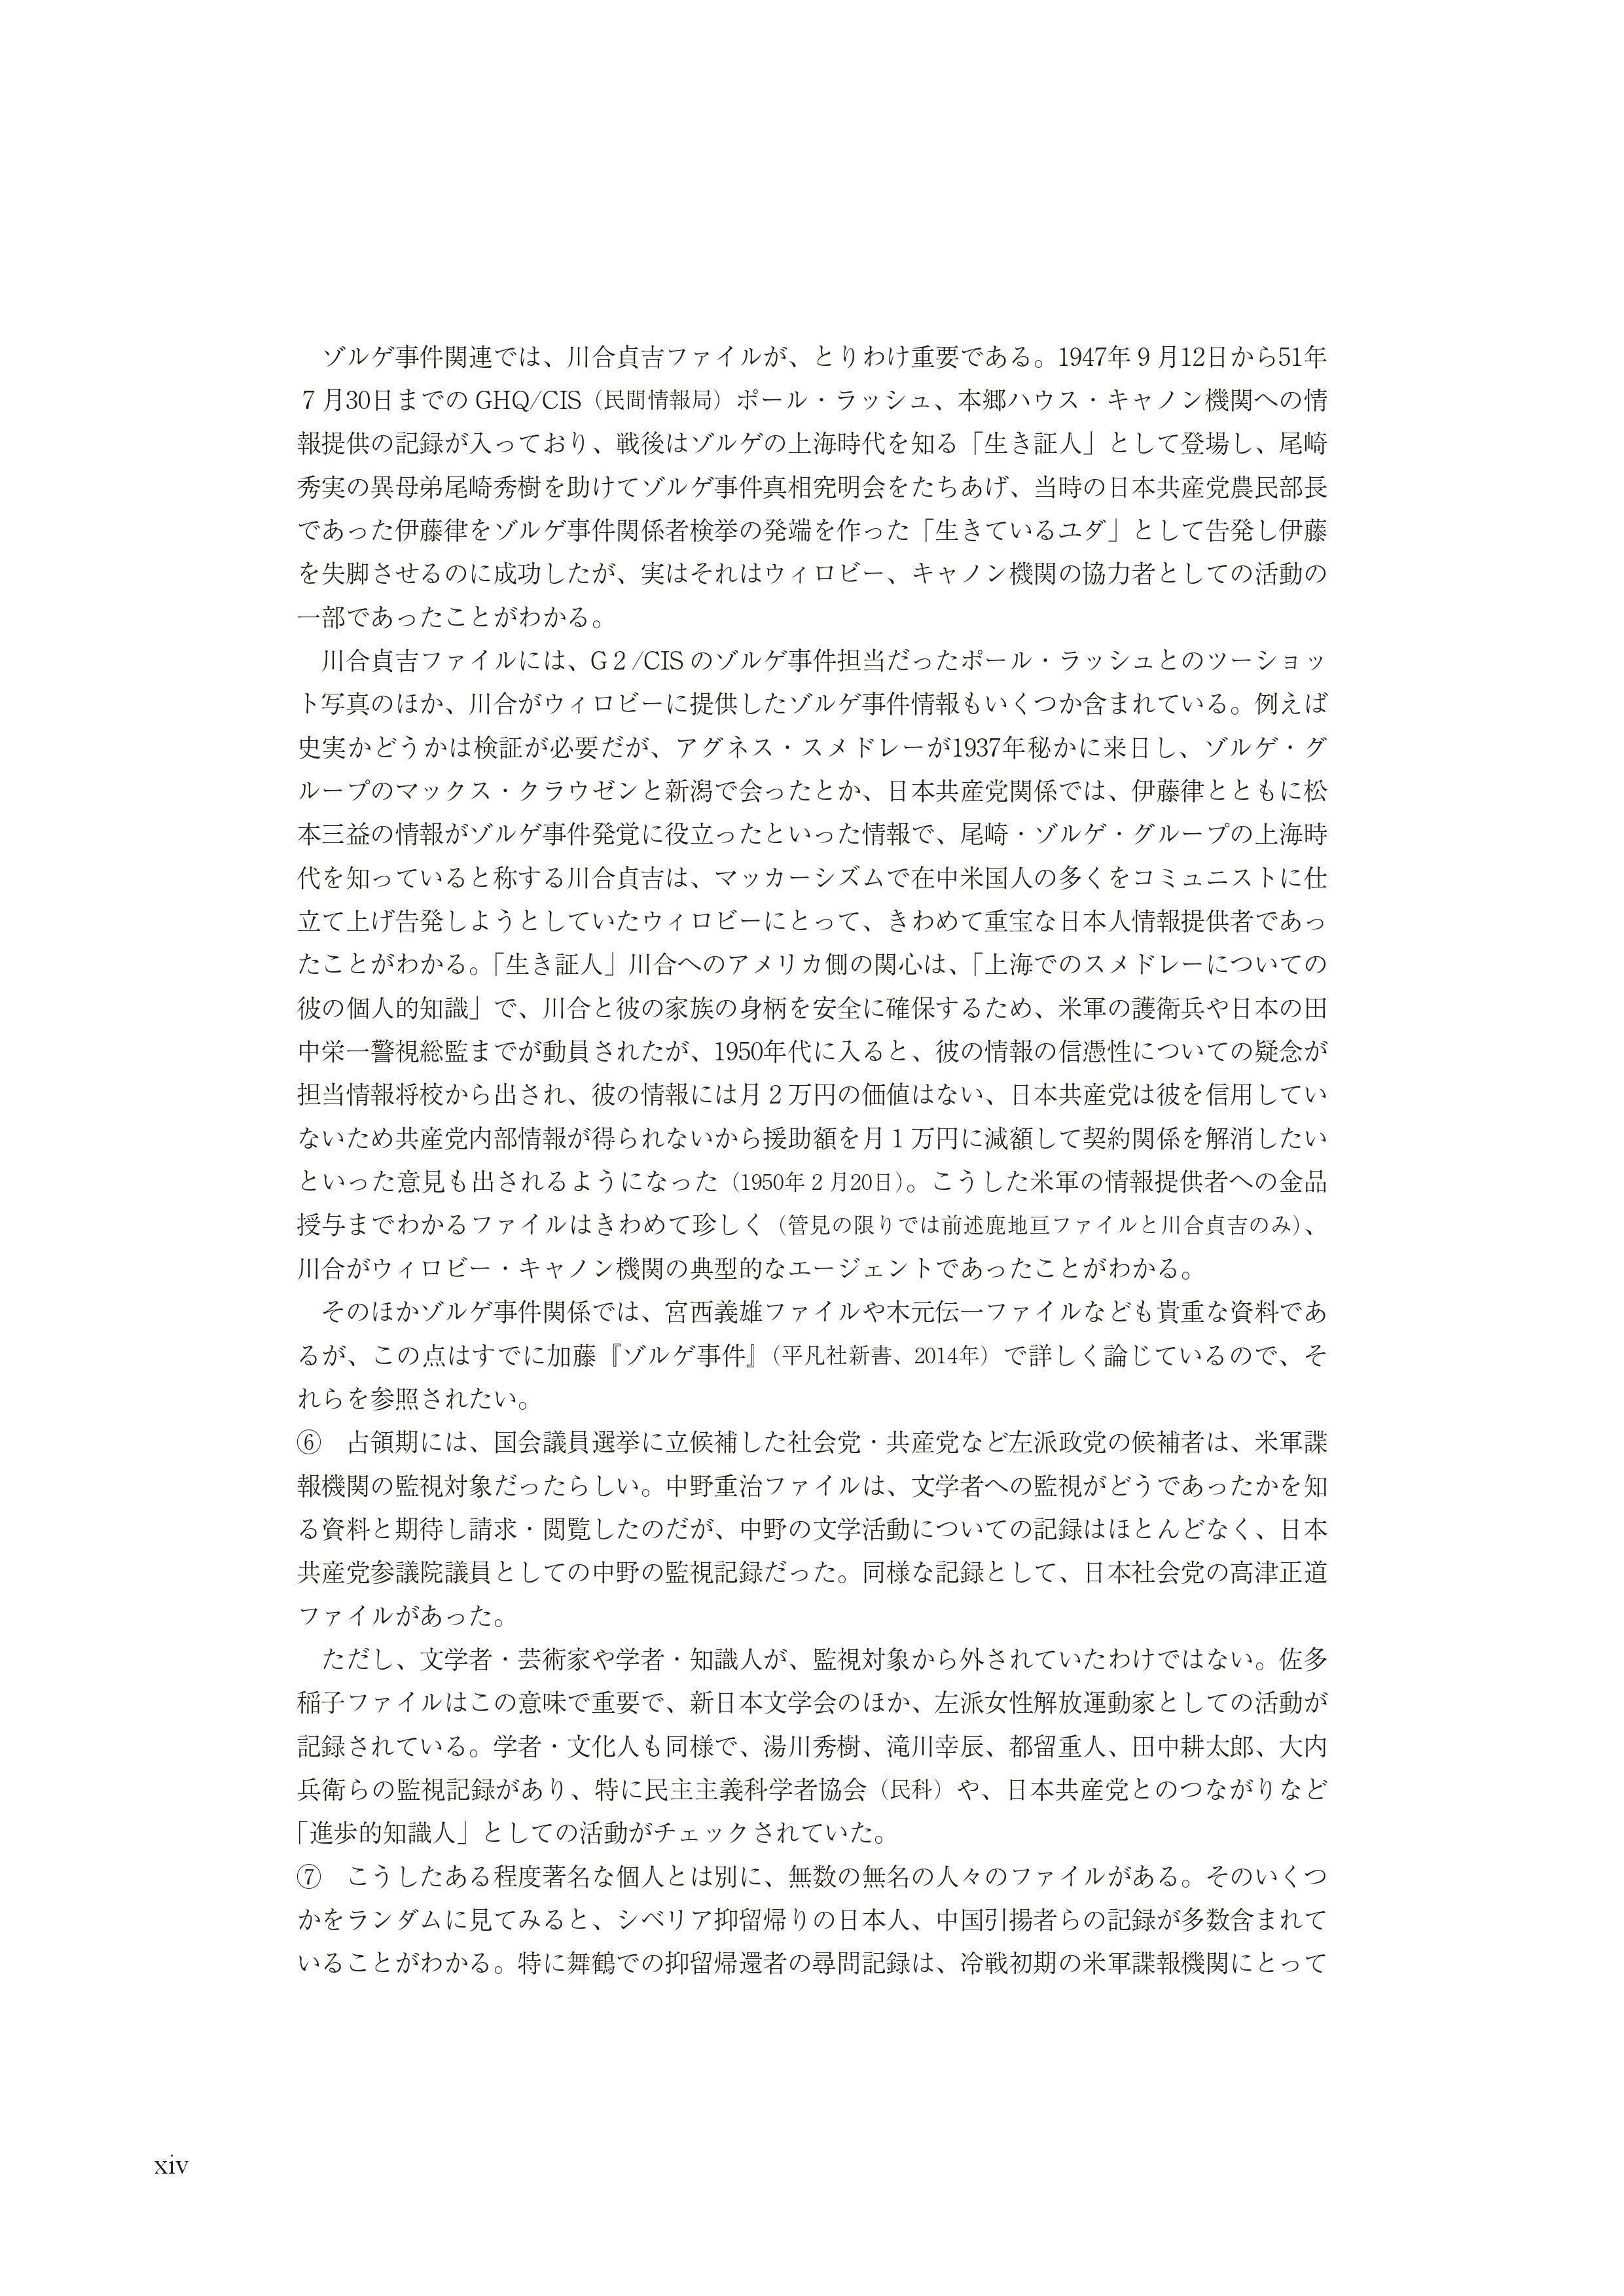 CIA日本人ファイル0001 (14)